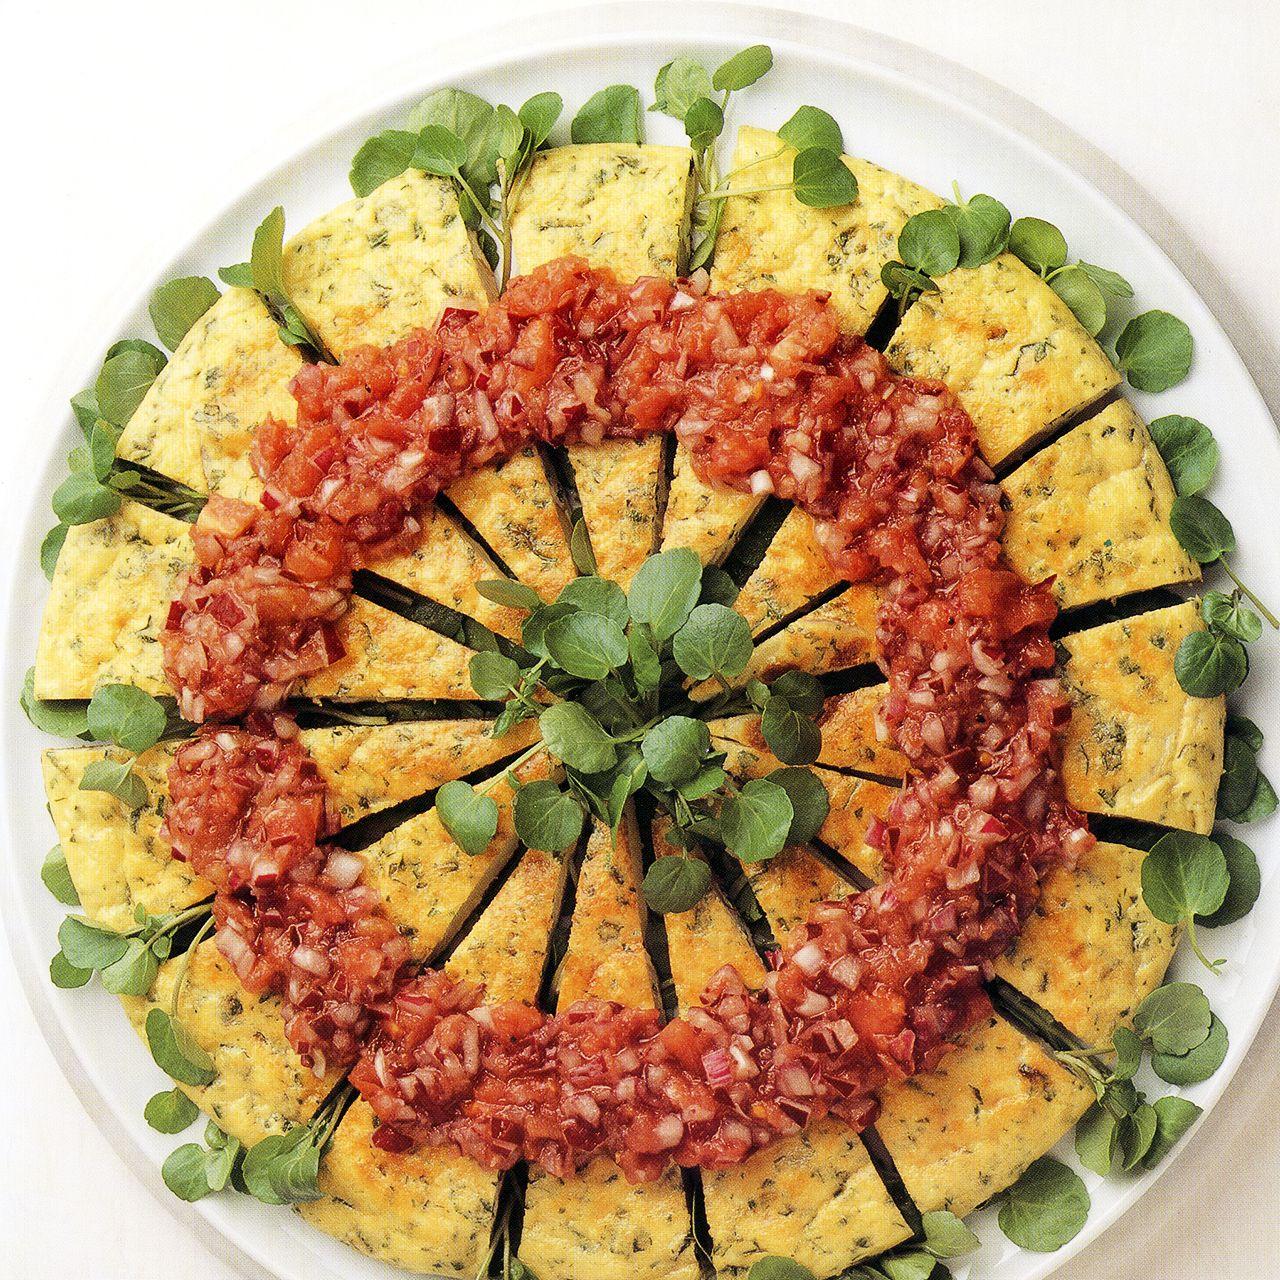 Herb and Potato Frittata Salad with Tomato and Onion Salsa